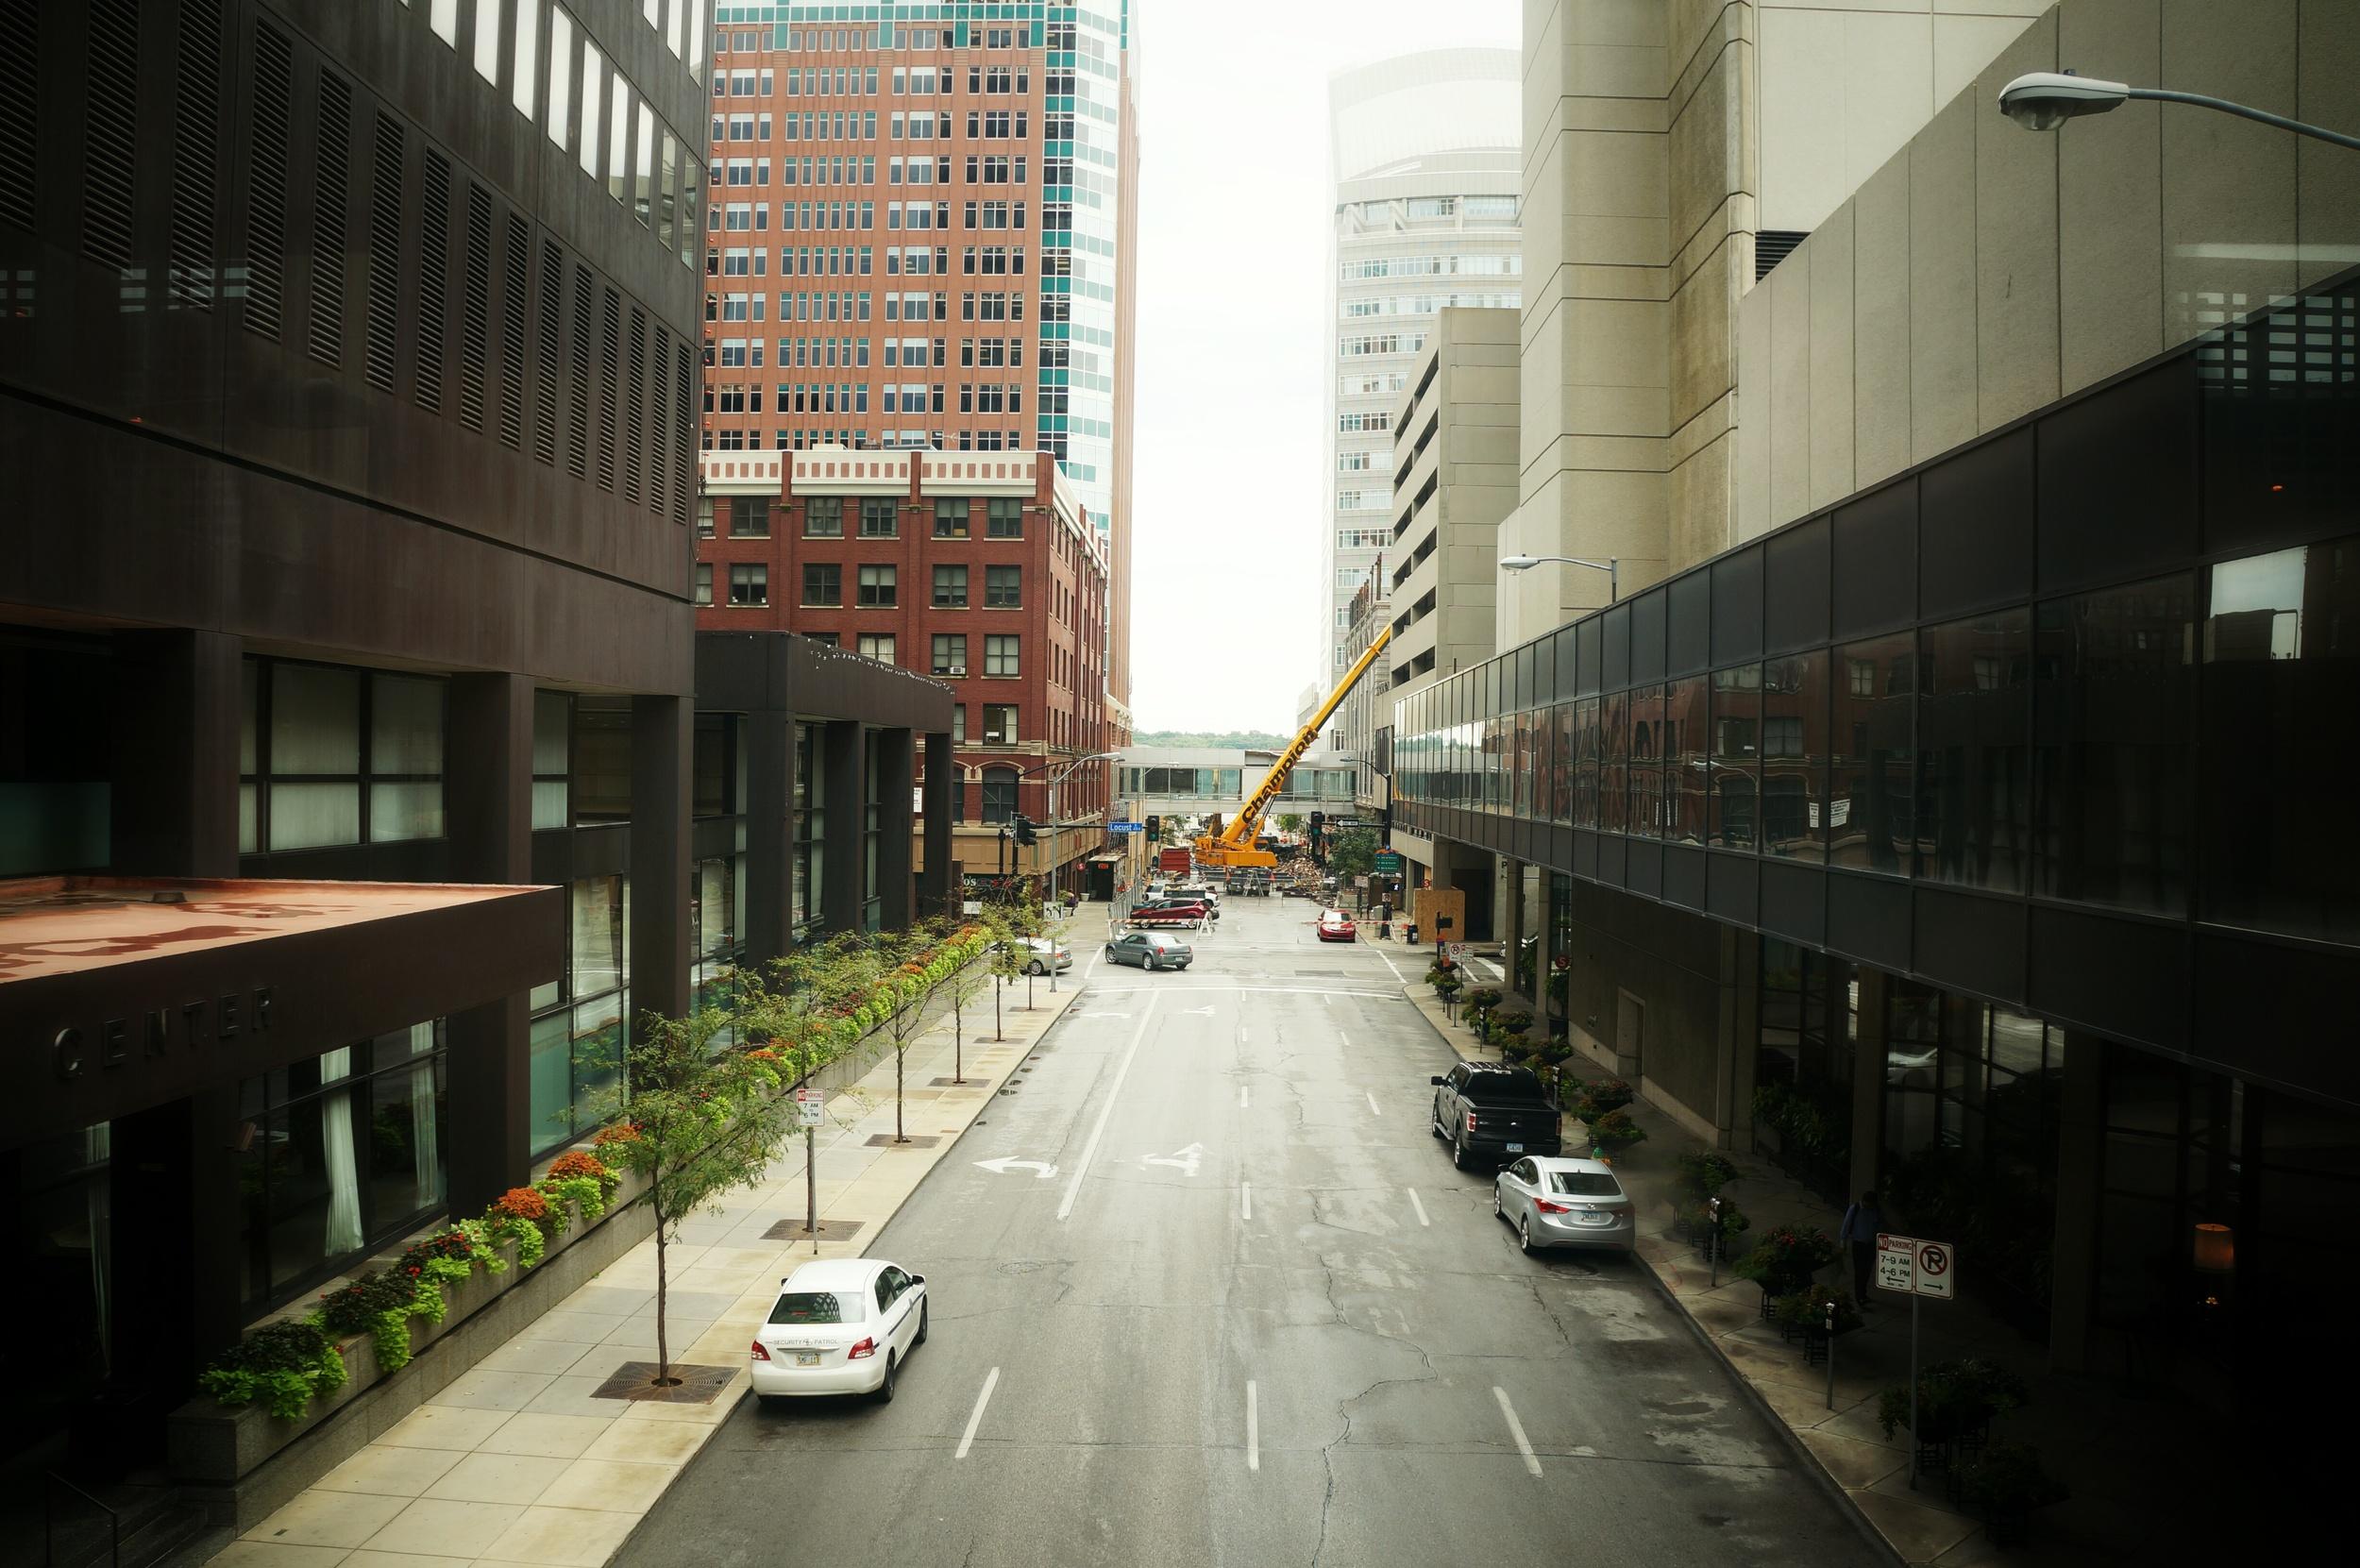 7th Street Des Moines